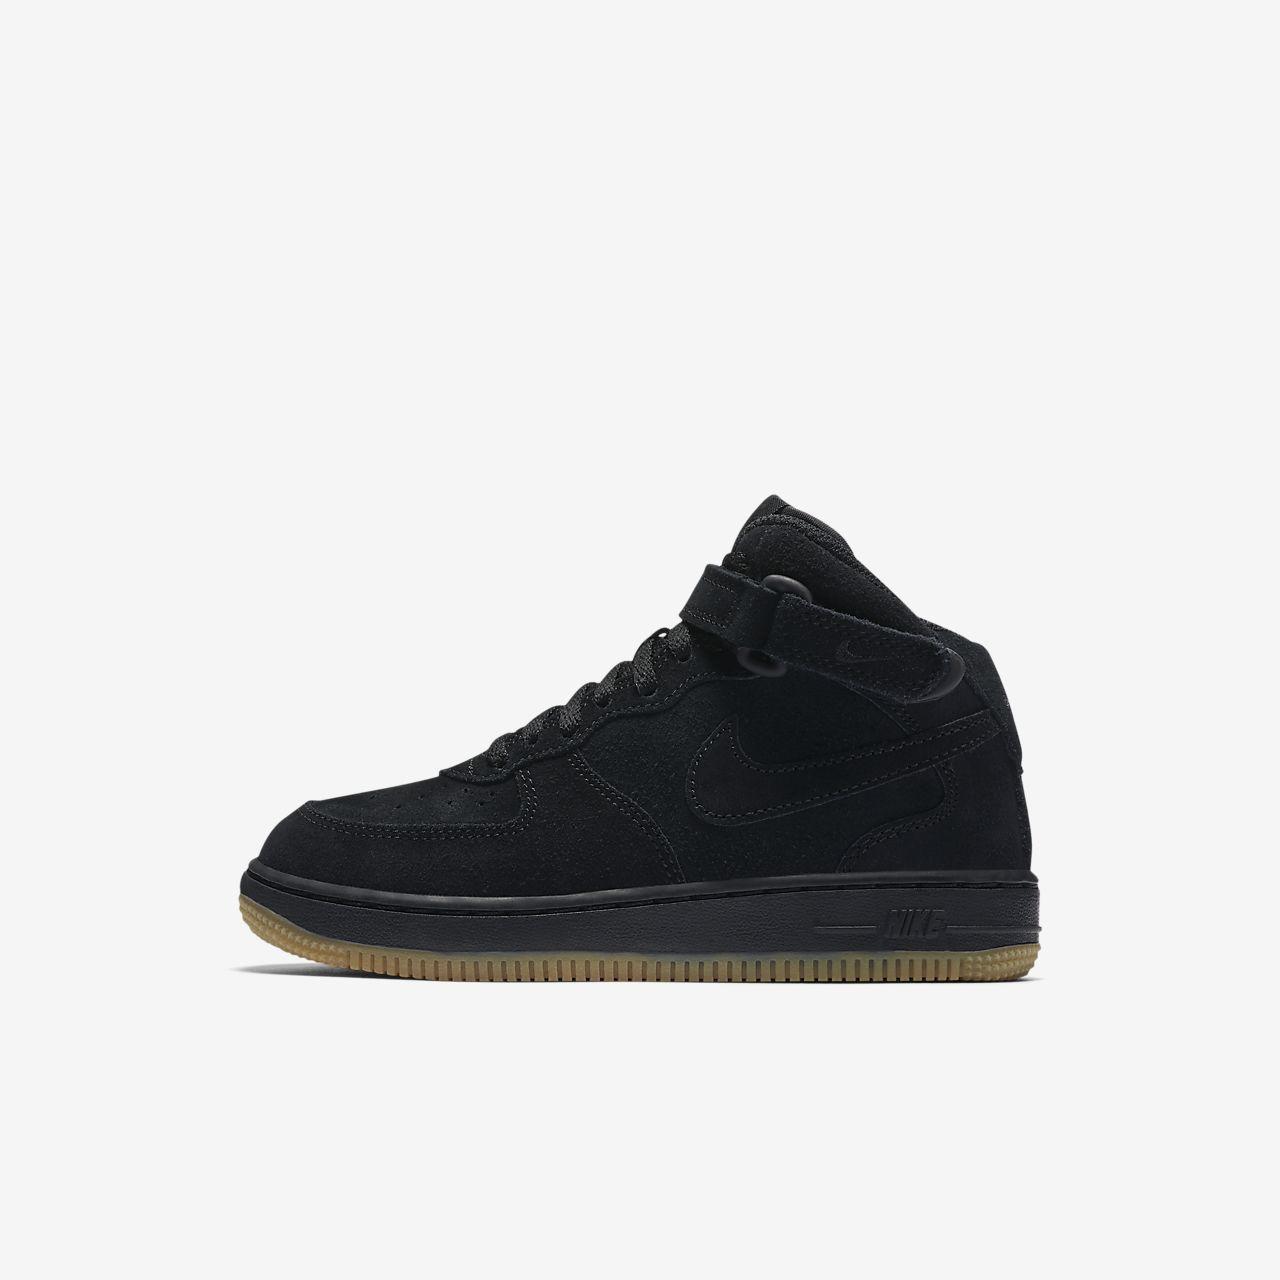 Nike Air Force 1 Mid LV8 Little Kids' Shoe